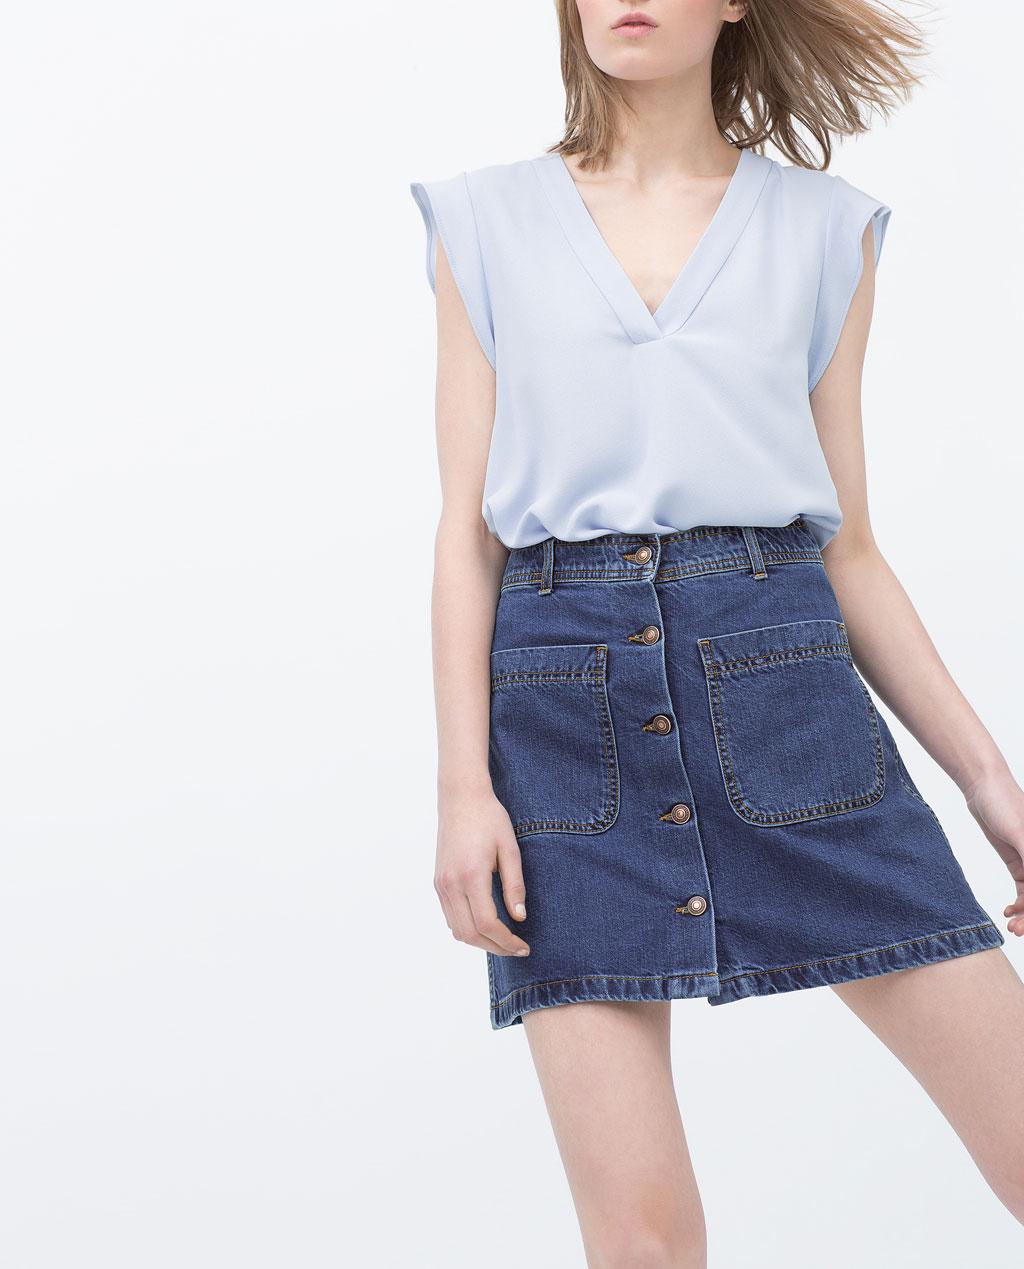 Styleimprimatur_Zara_Denim_Mini_Skirt_Runway_Product_Outfit_Fashion_Shopping_Blog